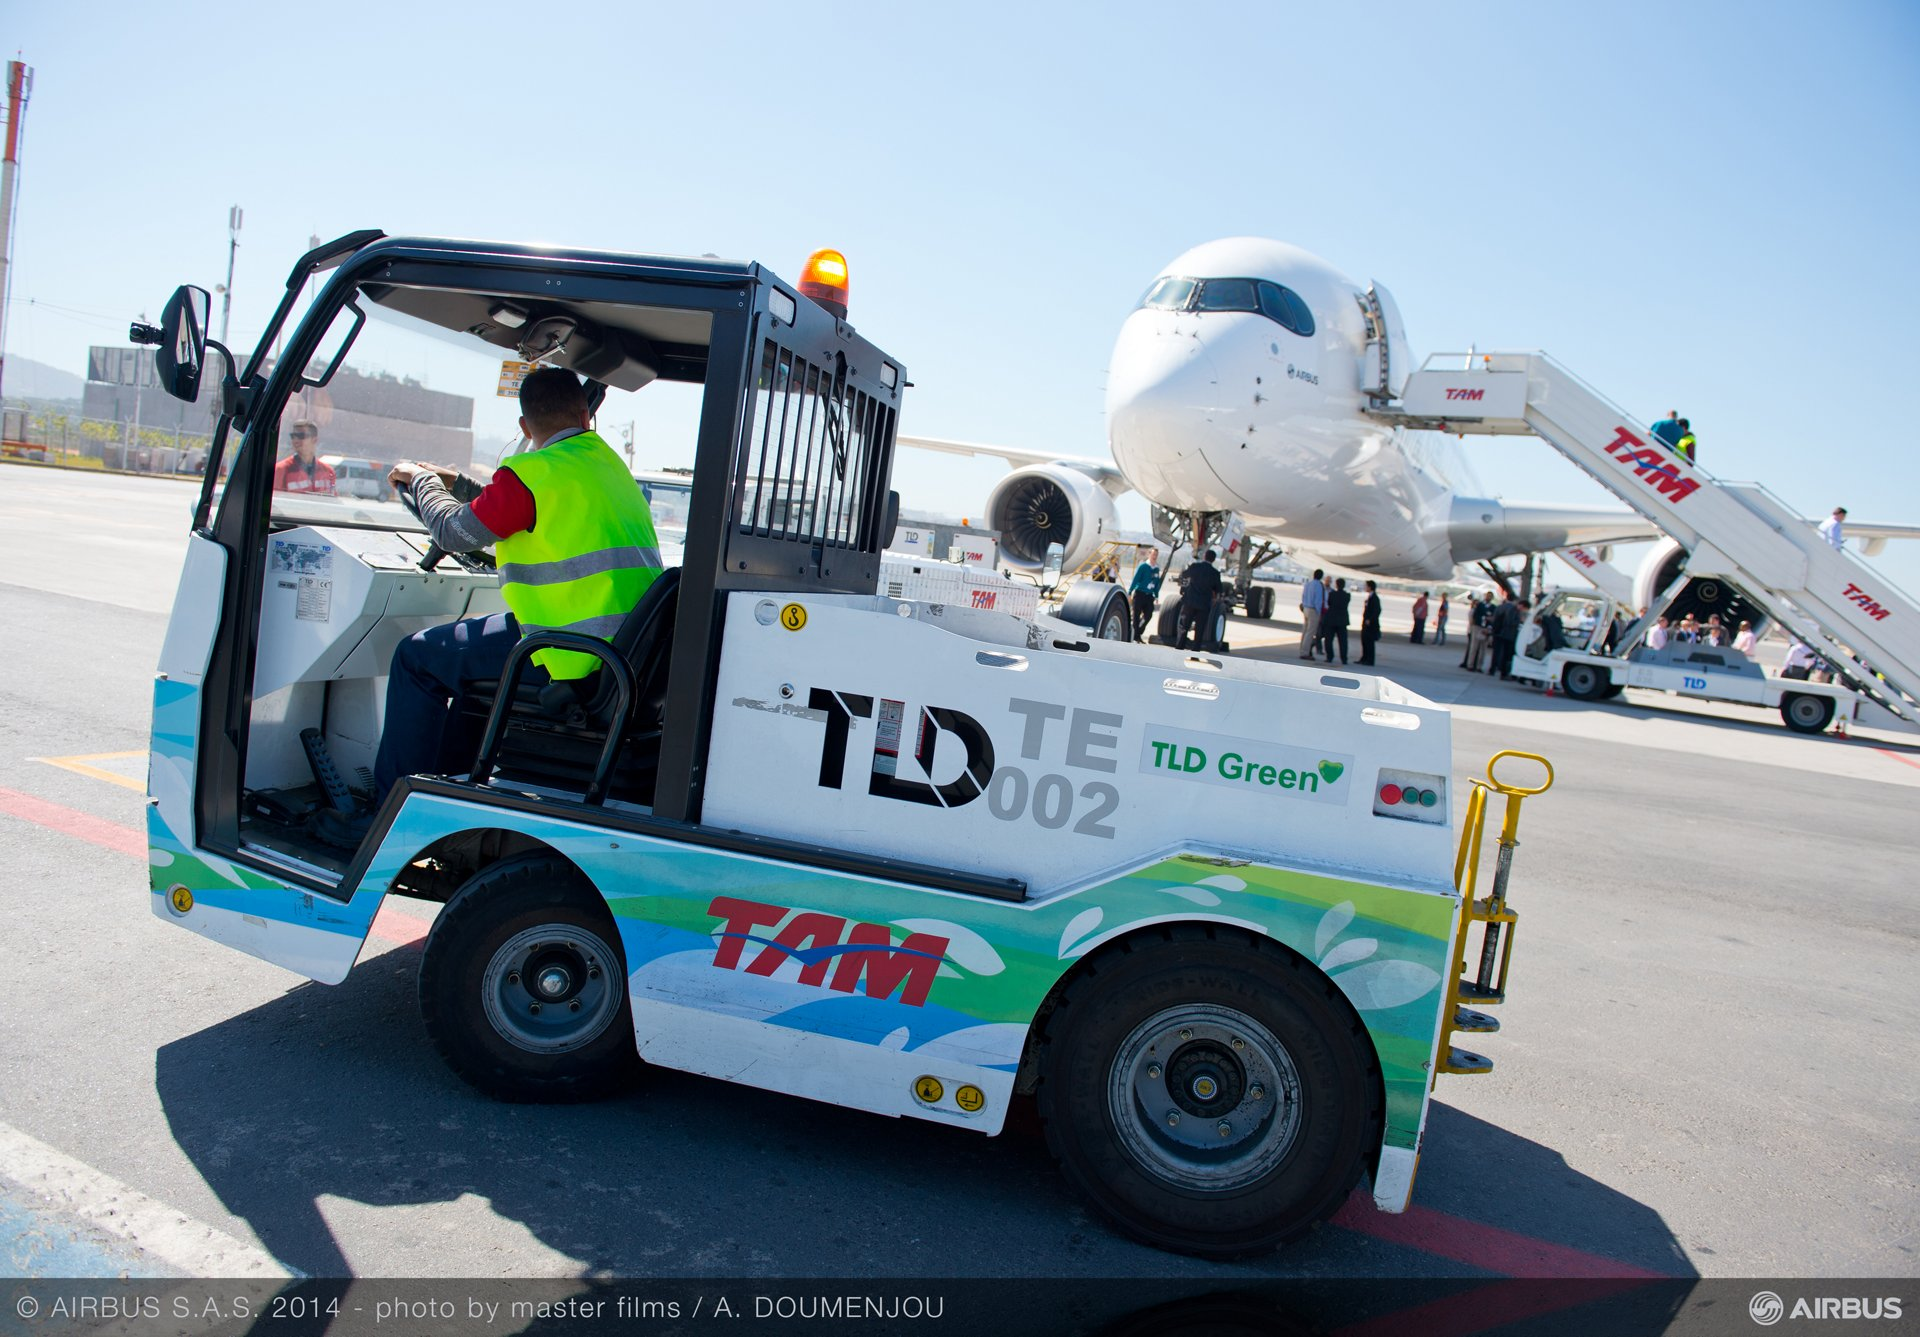 A350 XWB ROUTE PROVING TRIP 3 - SAO PAULO AIRPORT, A350 XWB route proving Sao Paulo Brazil 2